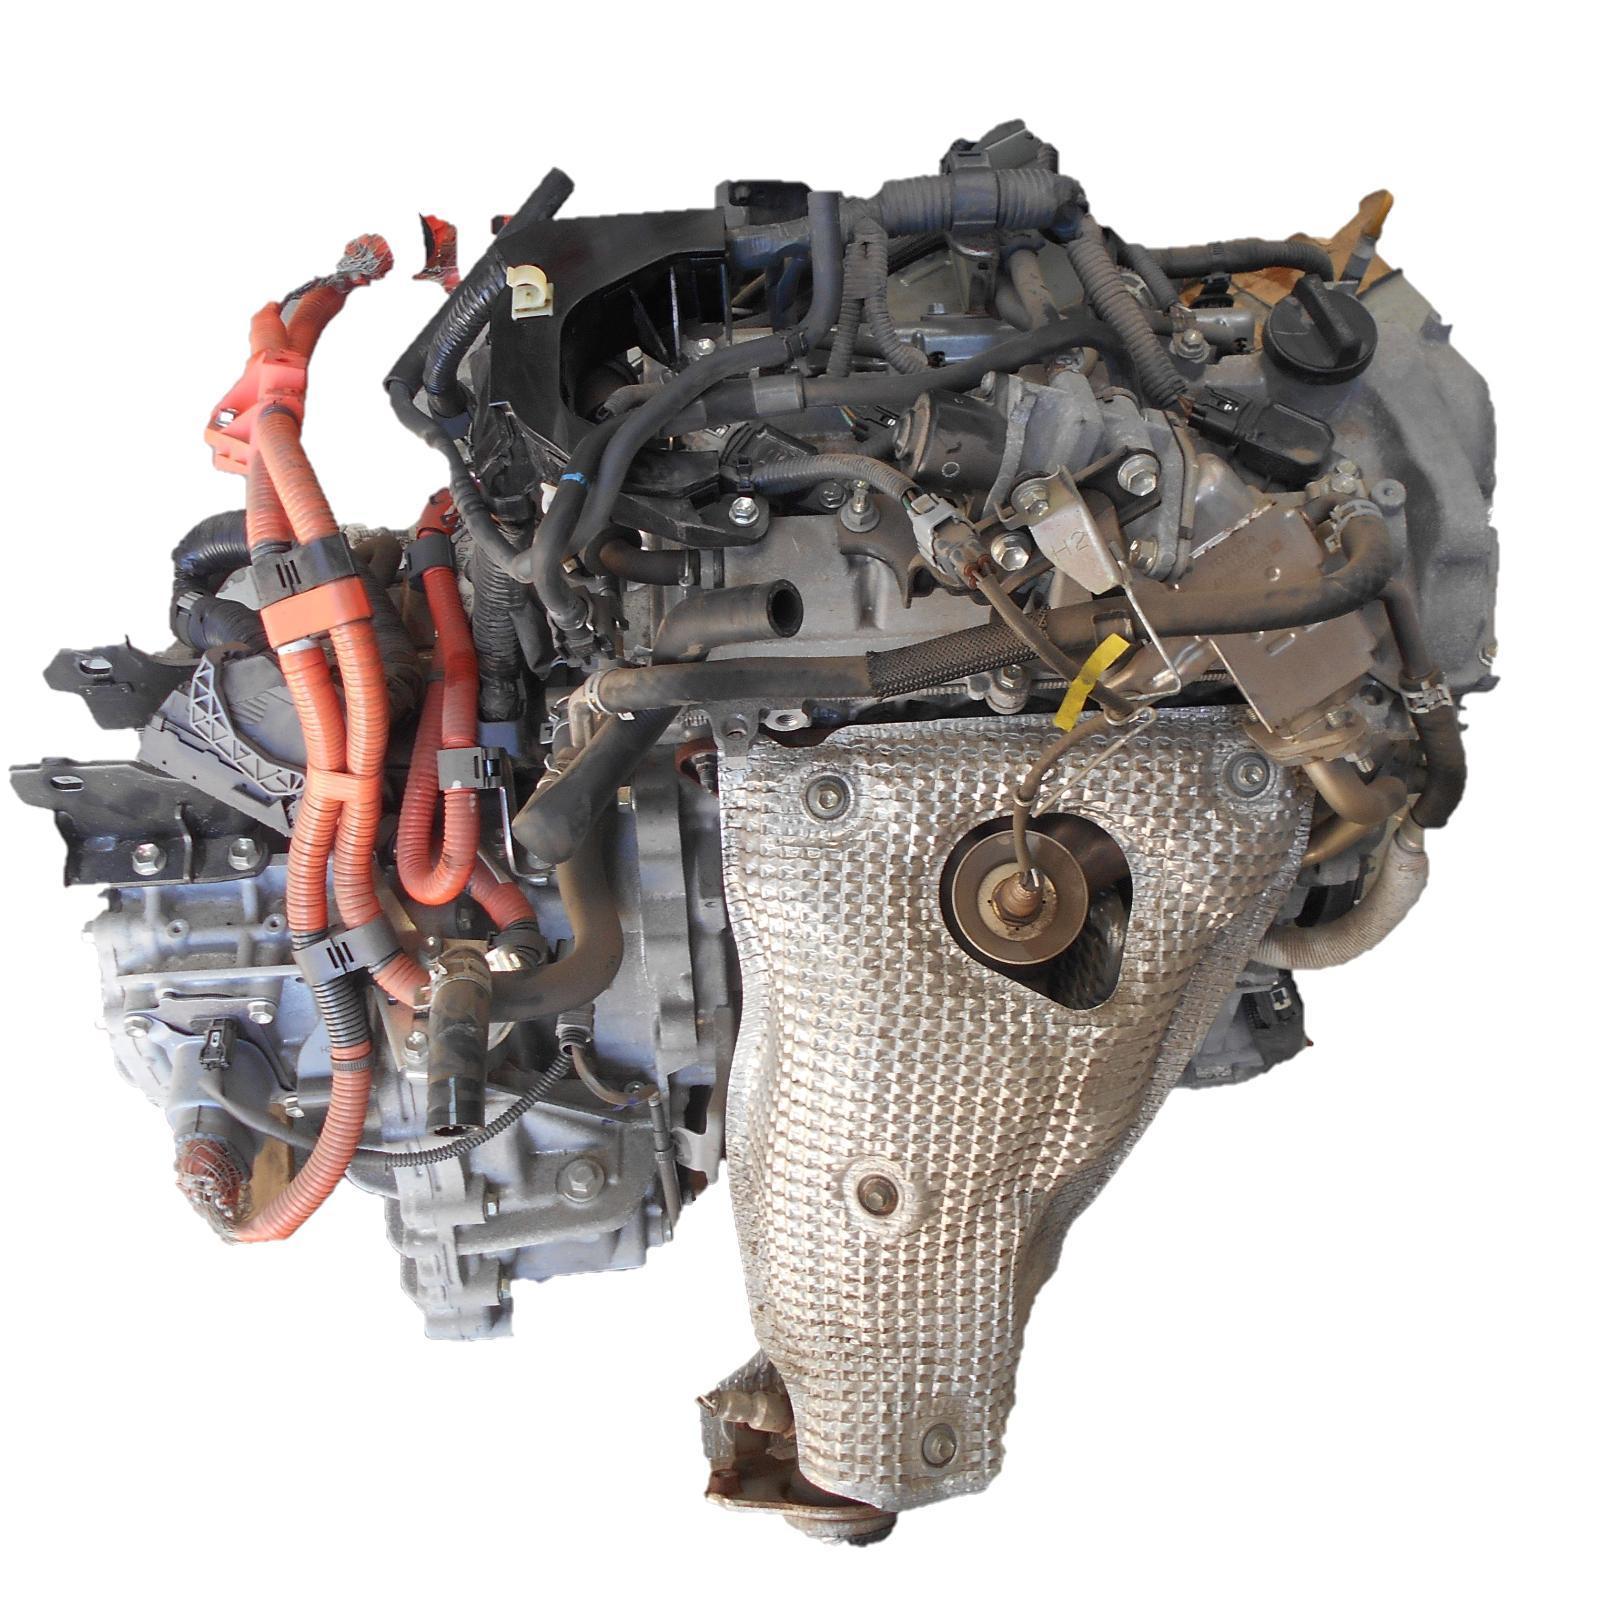 TOYOTA PRIUS, Engine, PETROL, 1.5, 1NZ-FXE, NHP10R, 03/12-